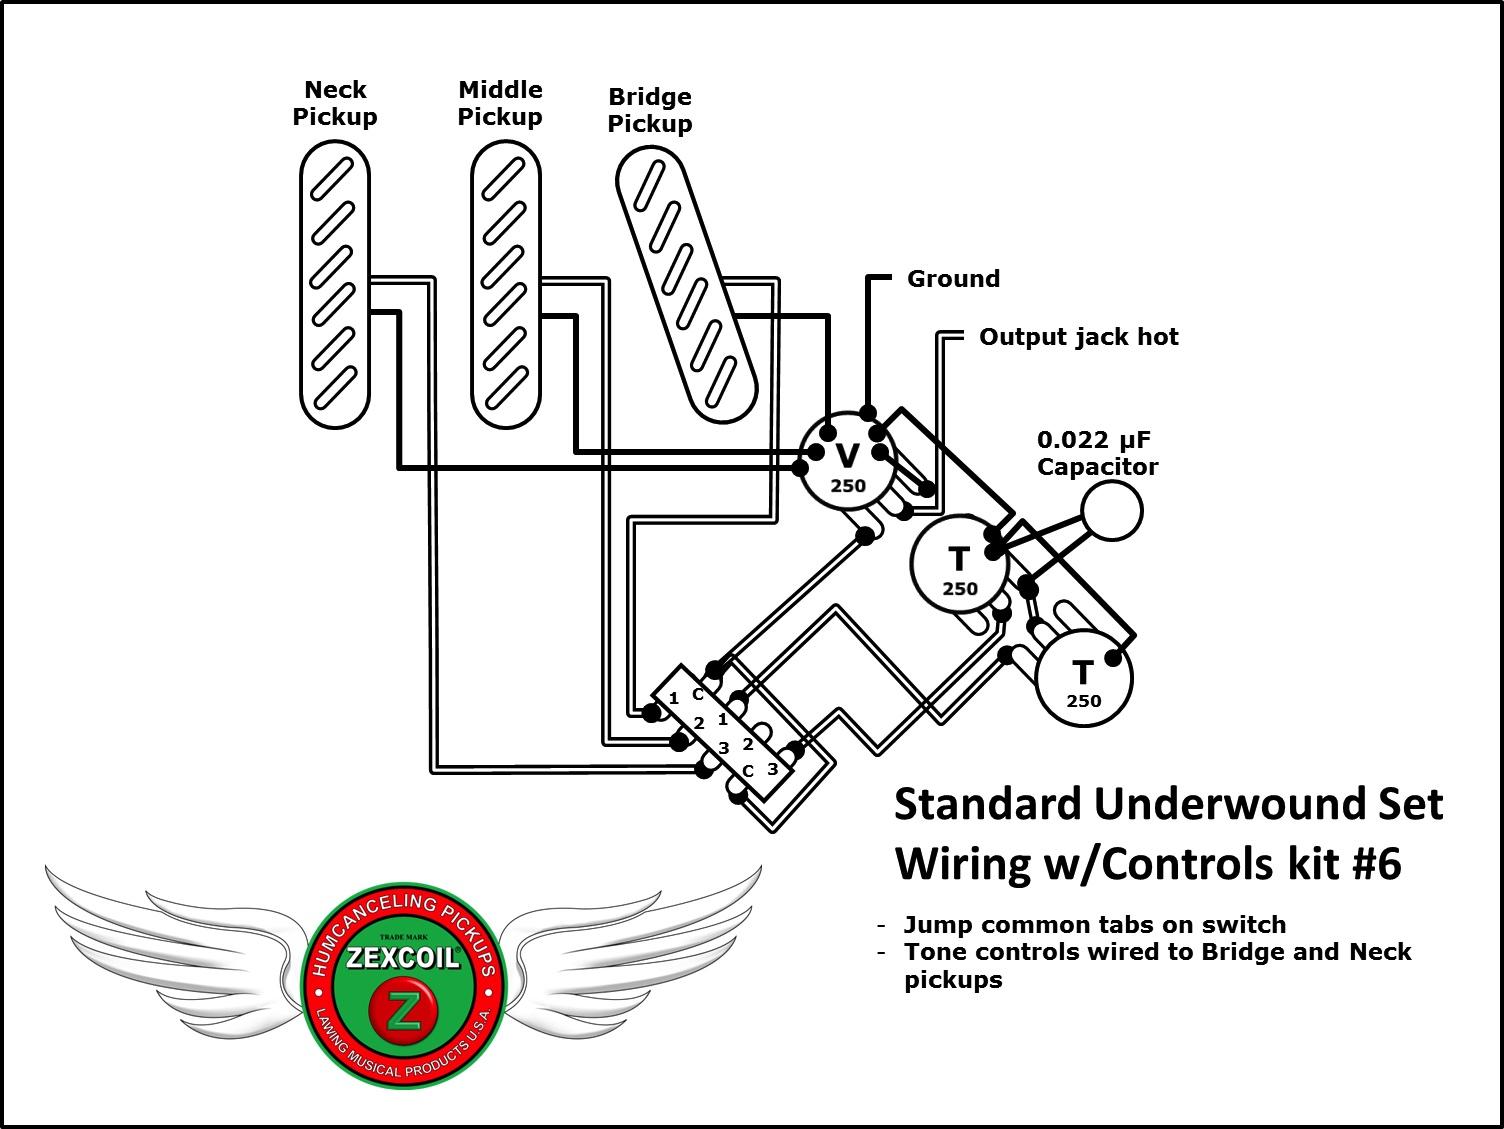 Controls Kit #6